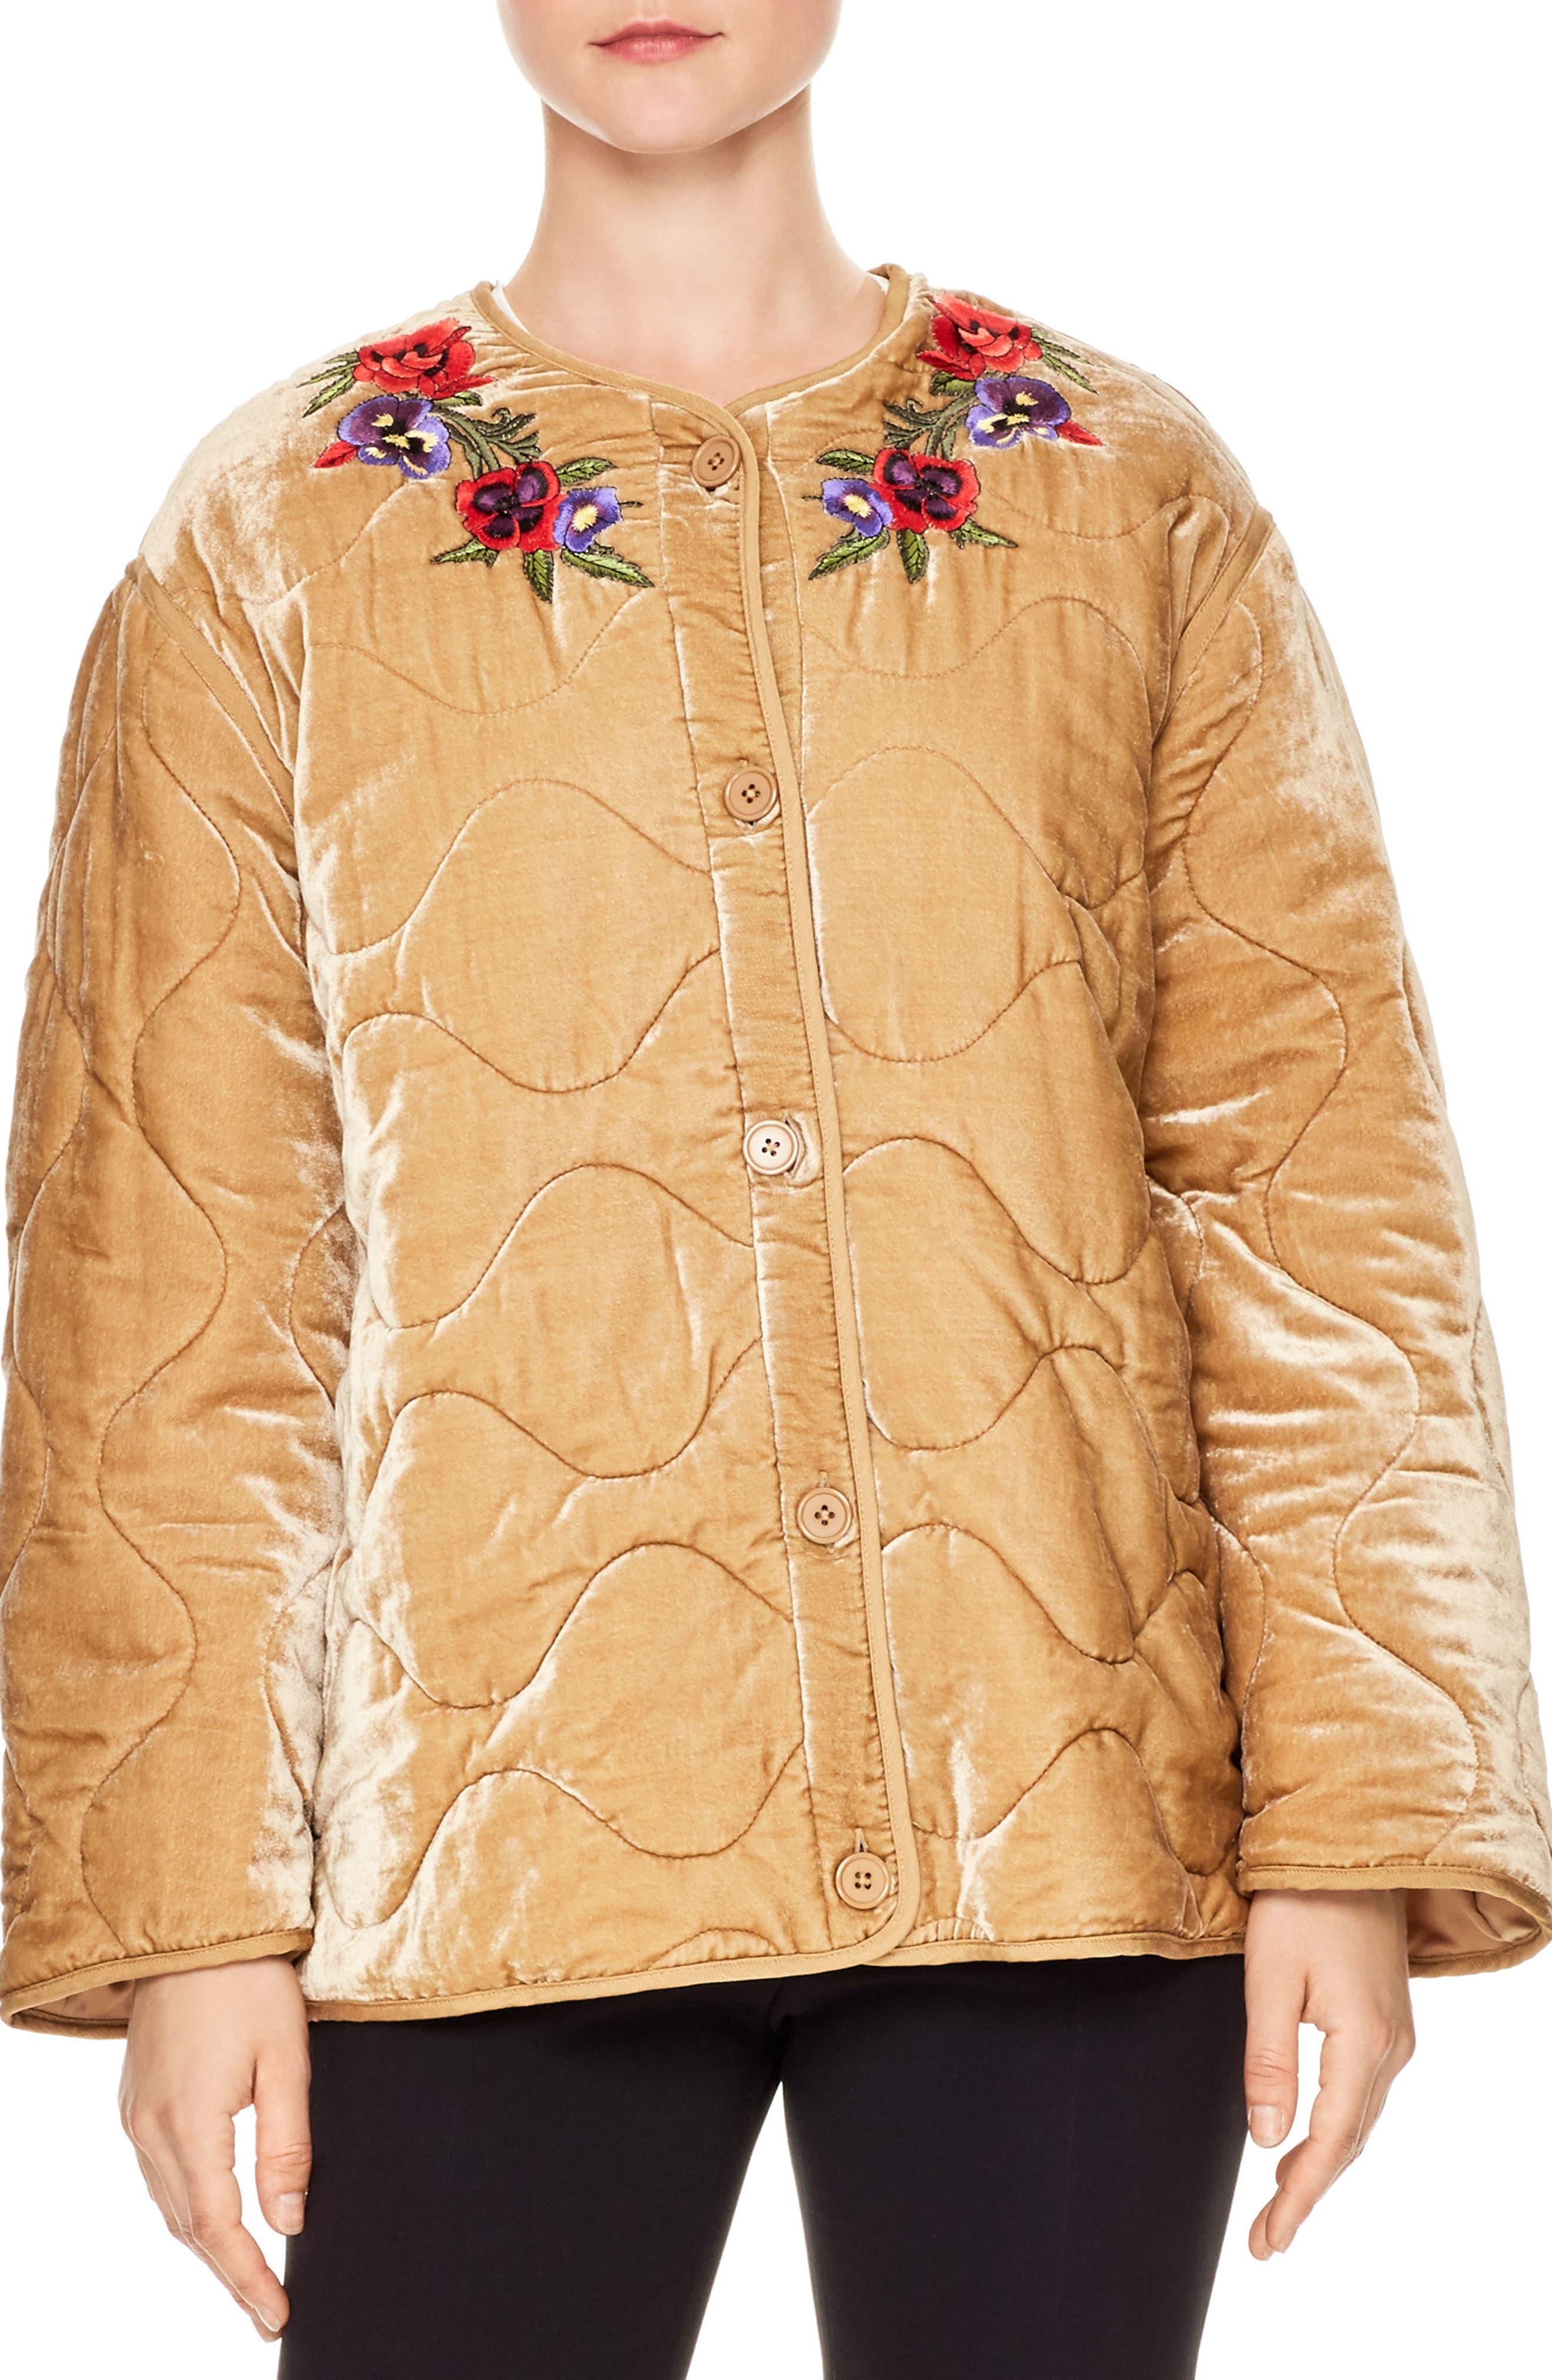 Reva Quilted Velvet Jacket,                         Main,                         color, 251